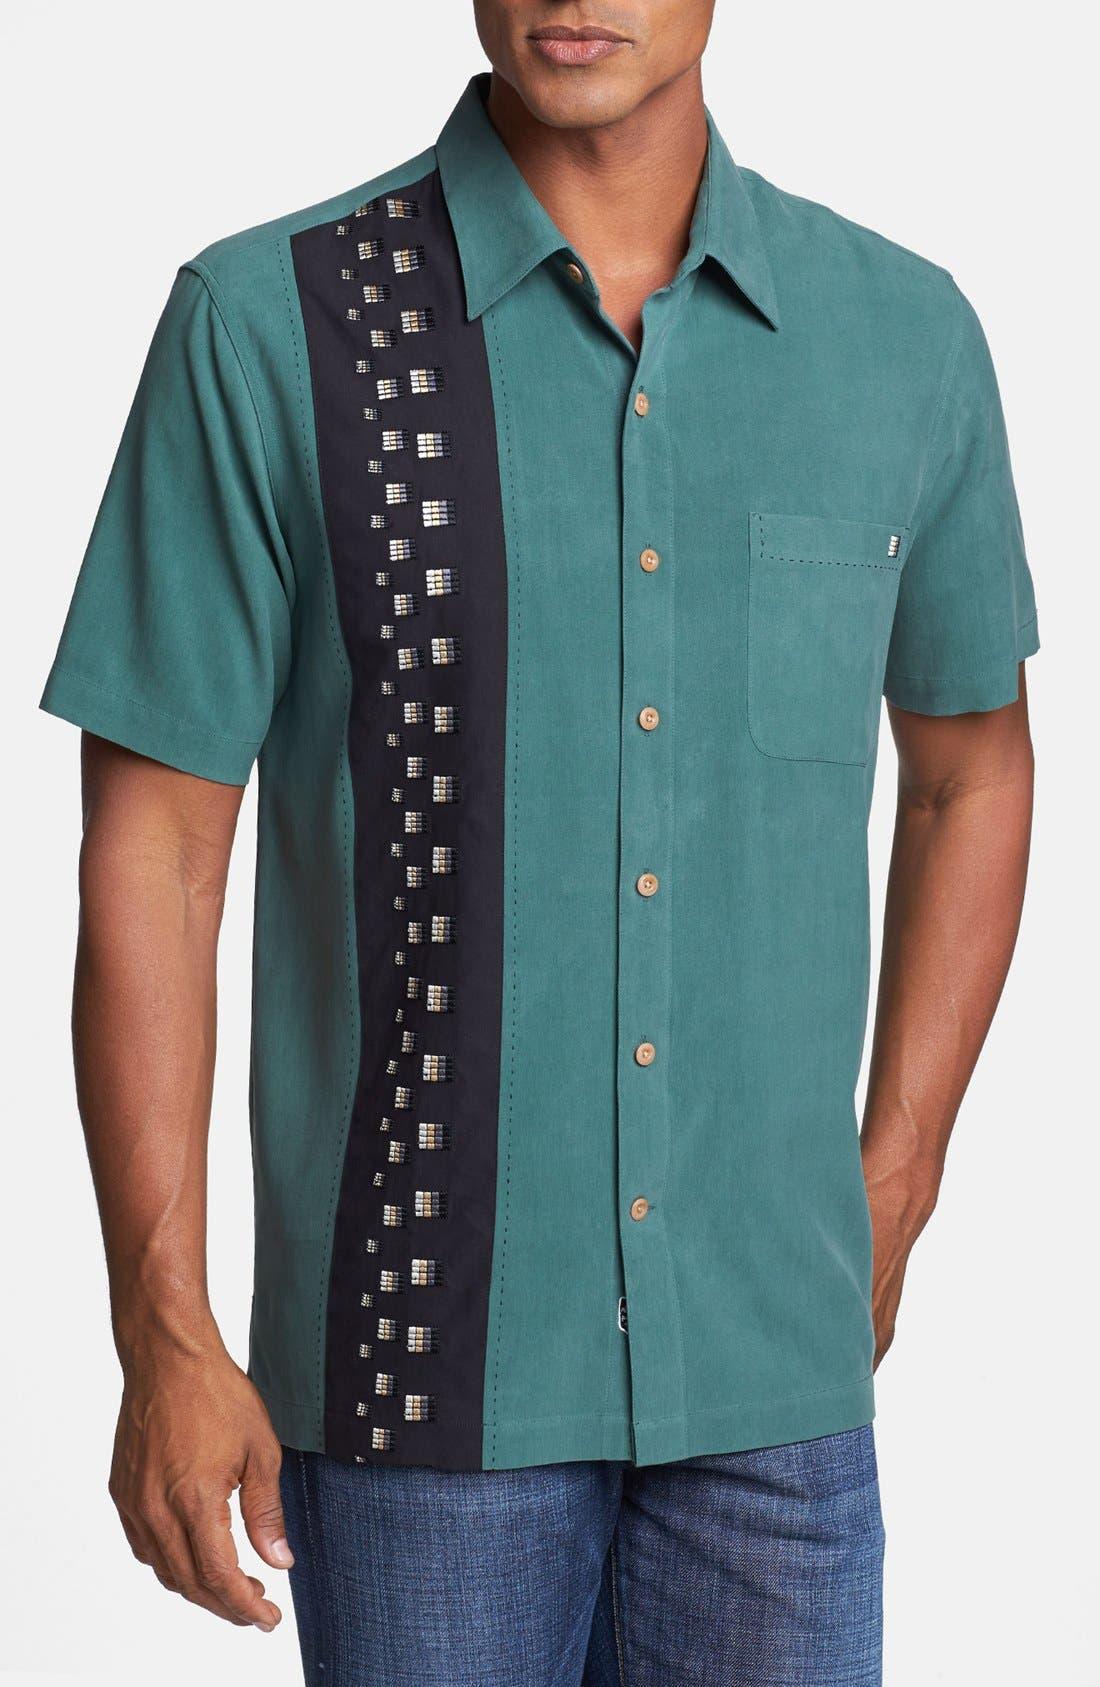 Alternate Image 1 Selected - Nat Nast 'Down the Line' Short Sleeve Silk Sport Shirt